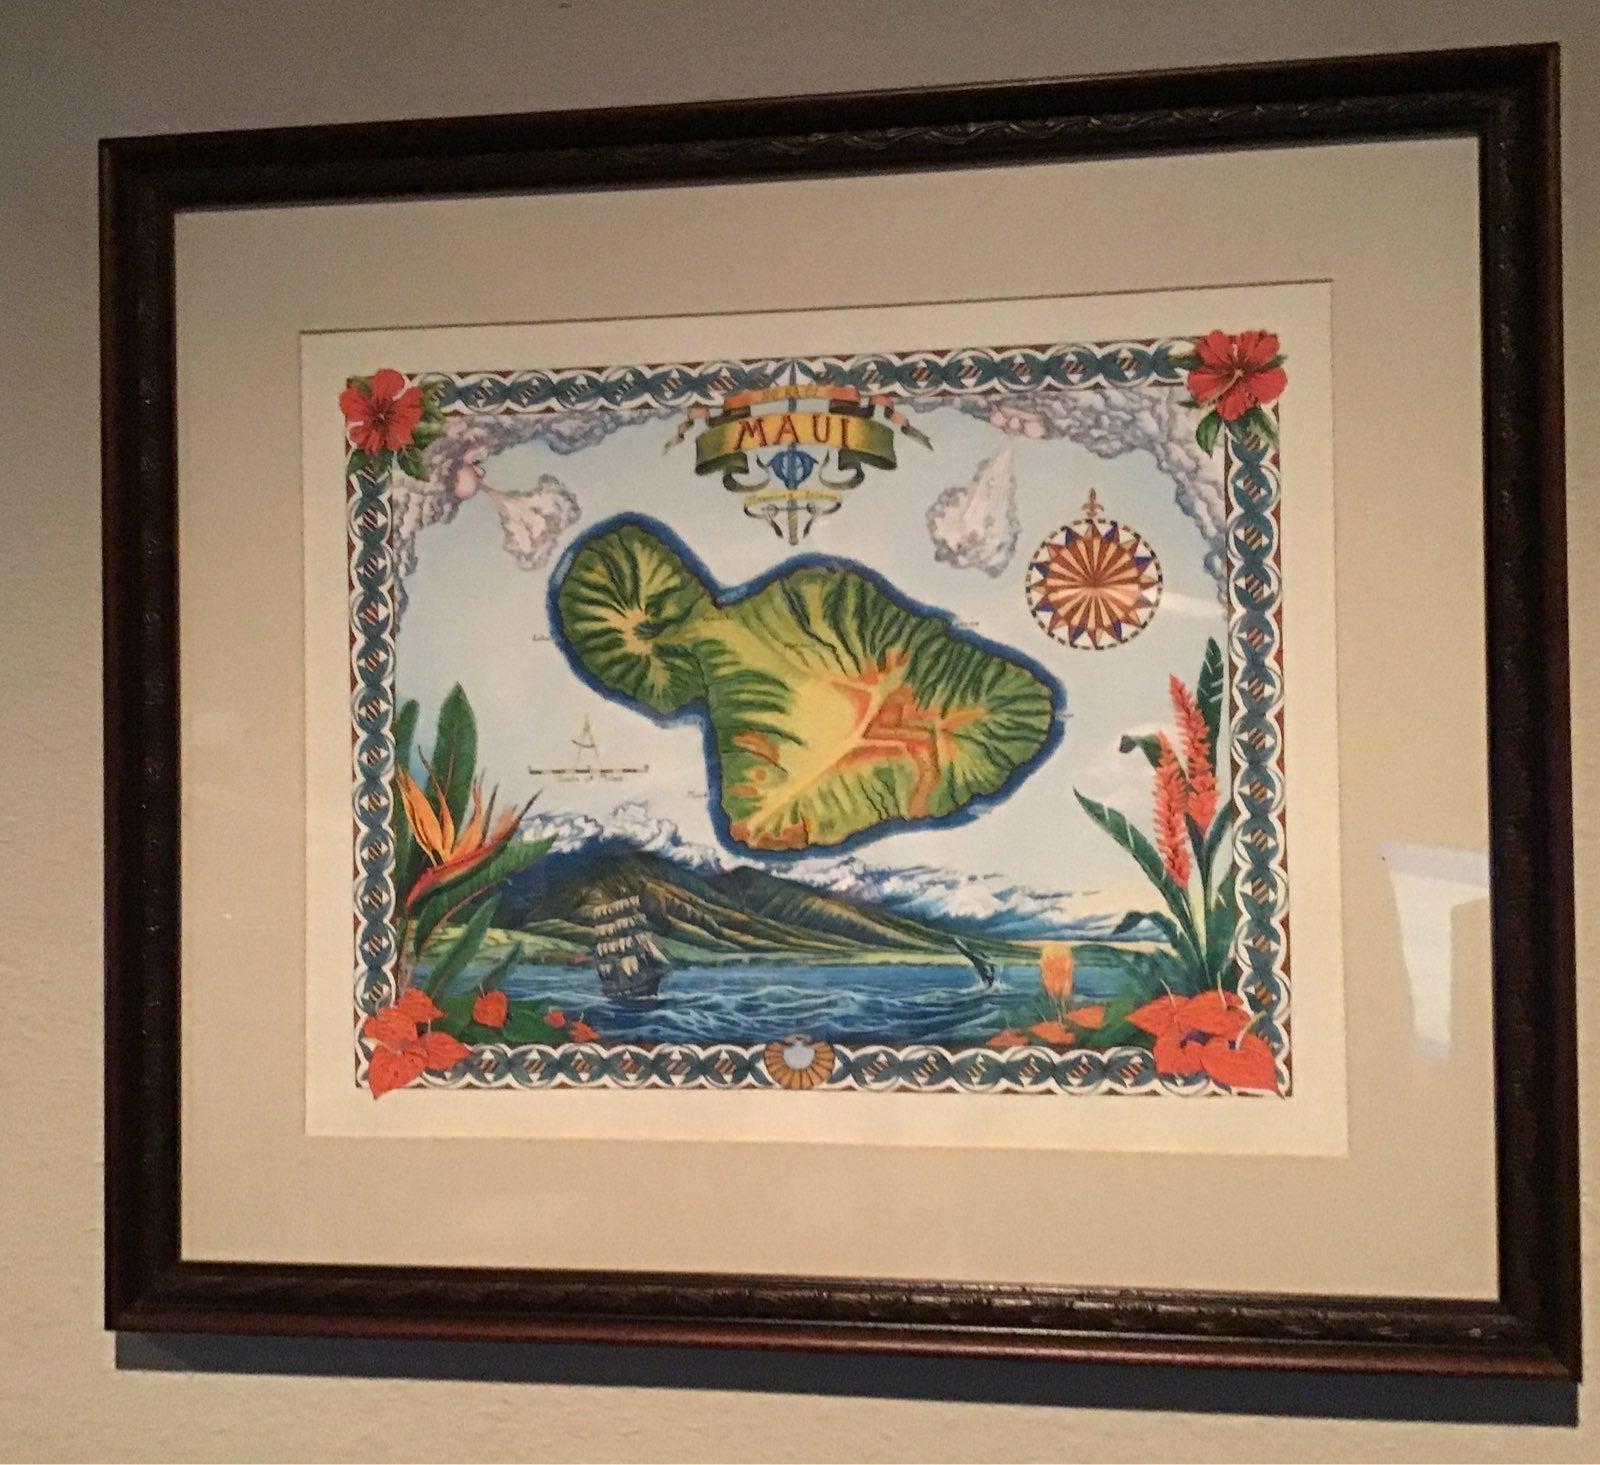 Large Framed Maui, Hawaii print